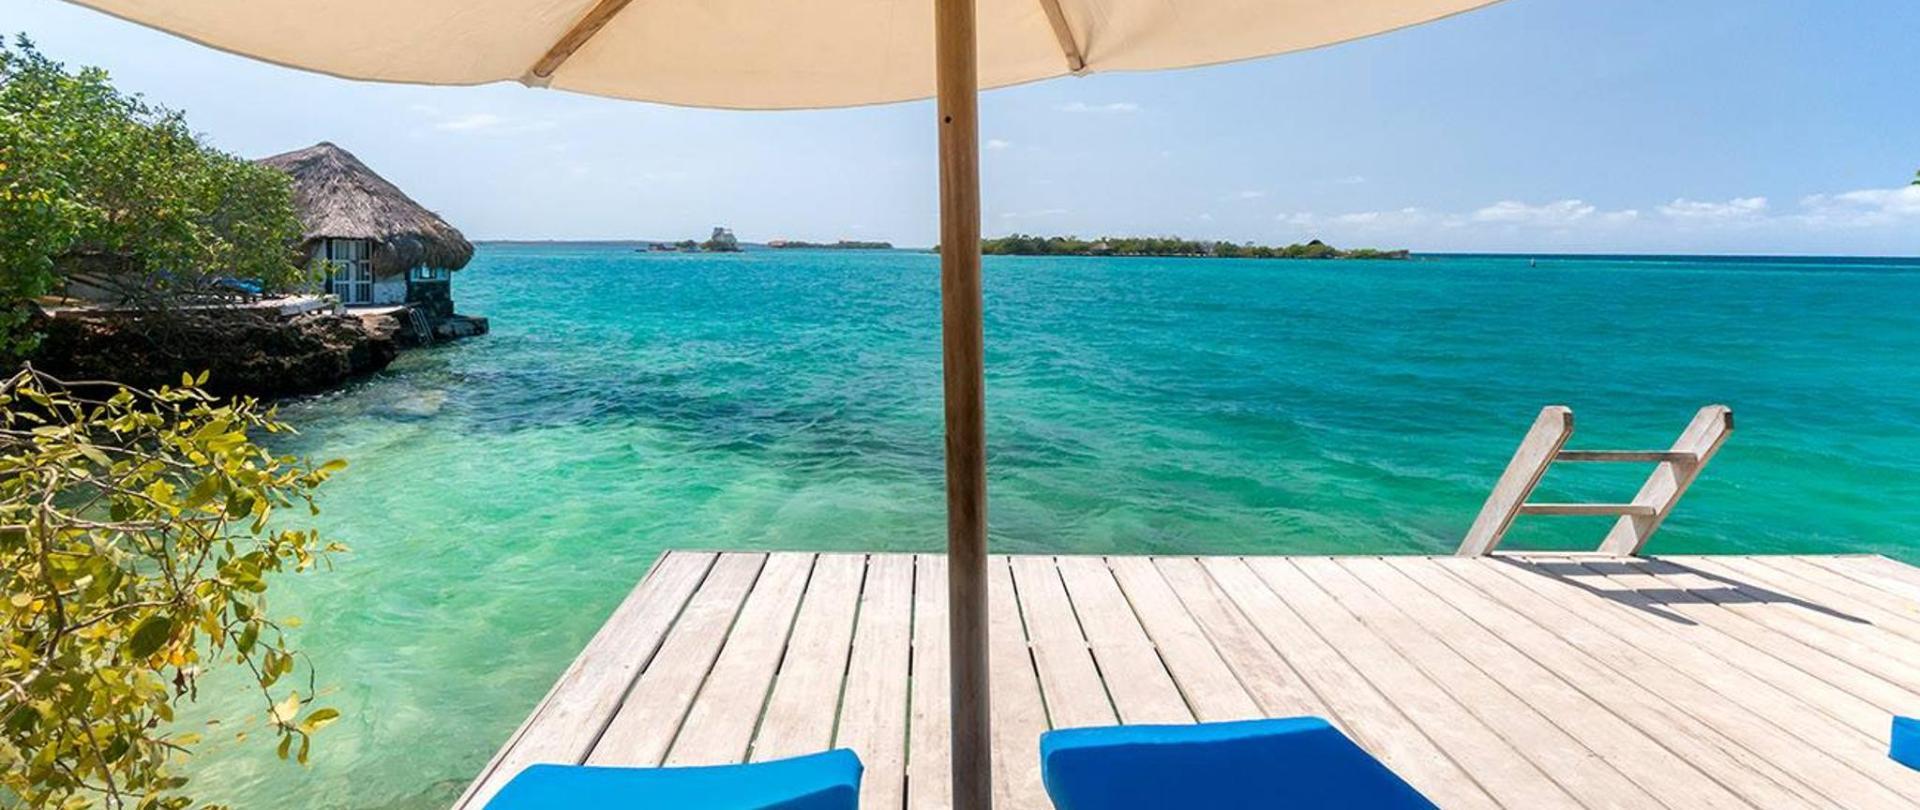 Coralina Island